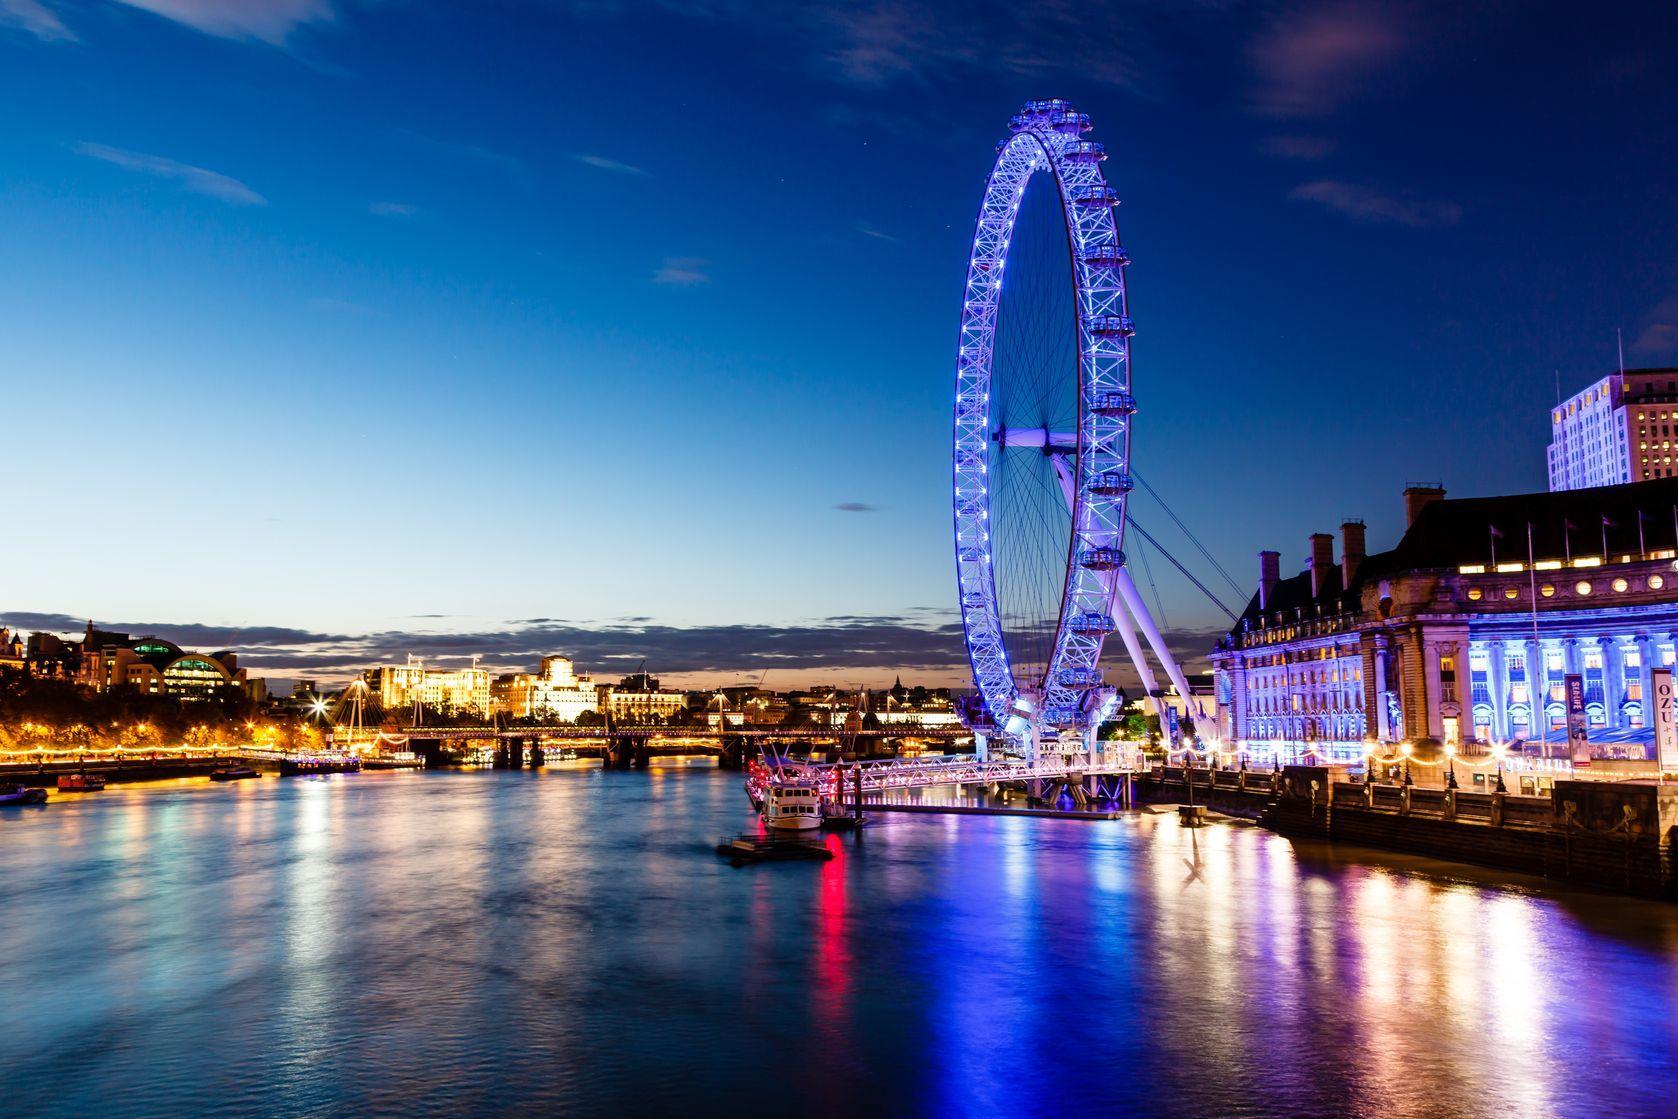 Panorama nočního Londýnu | anshar/123RF.com